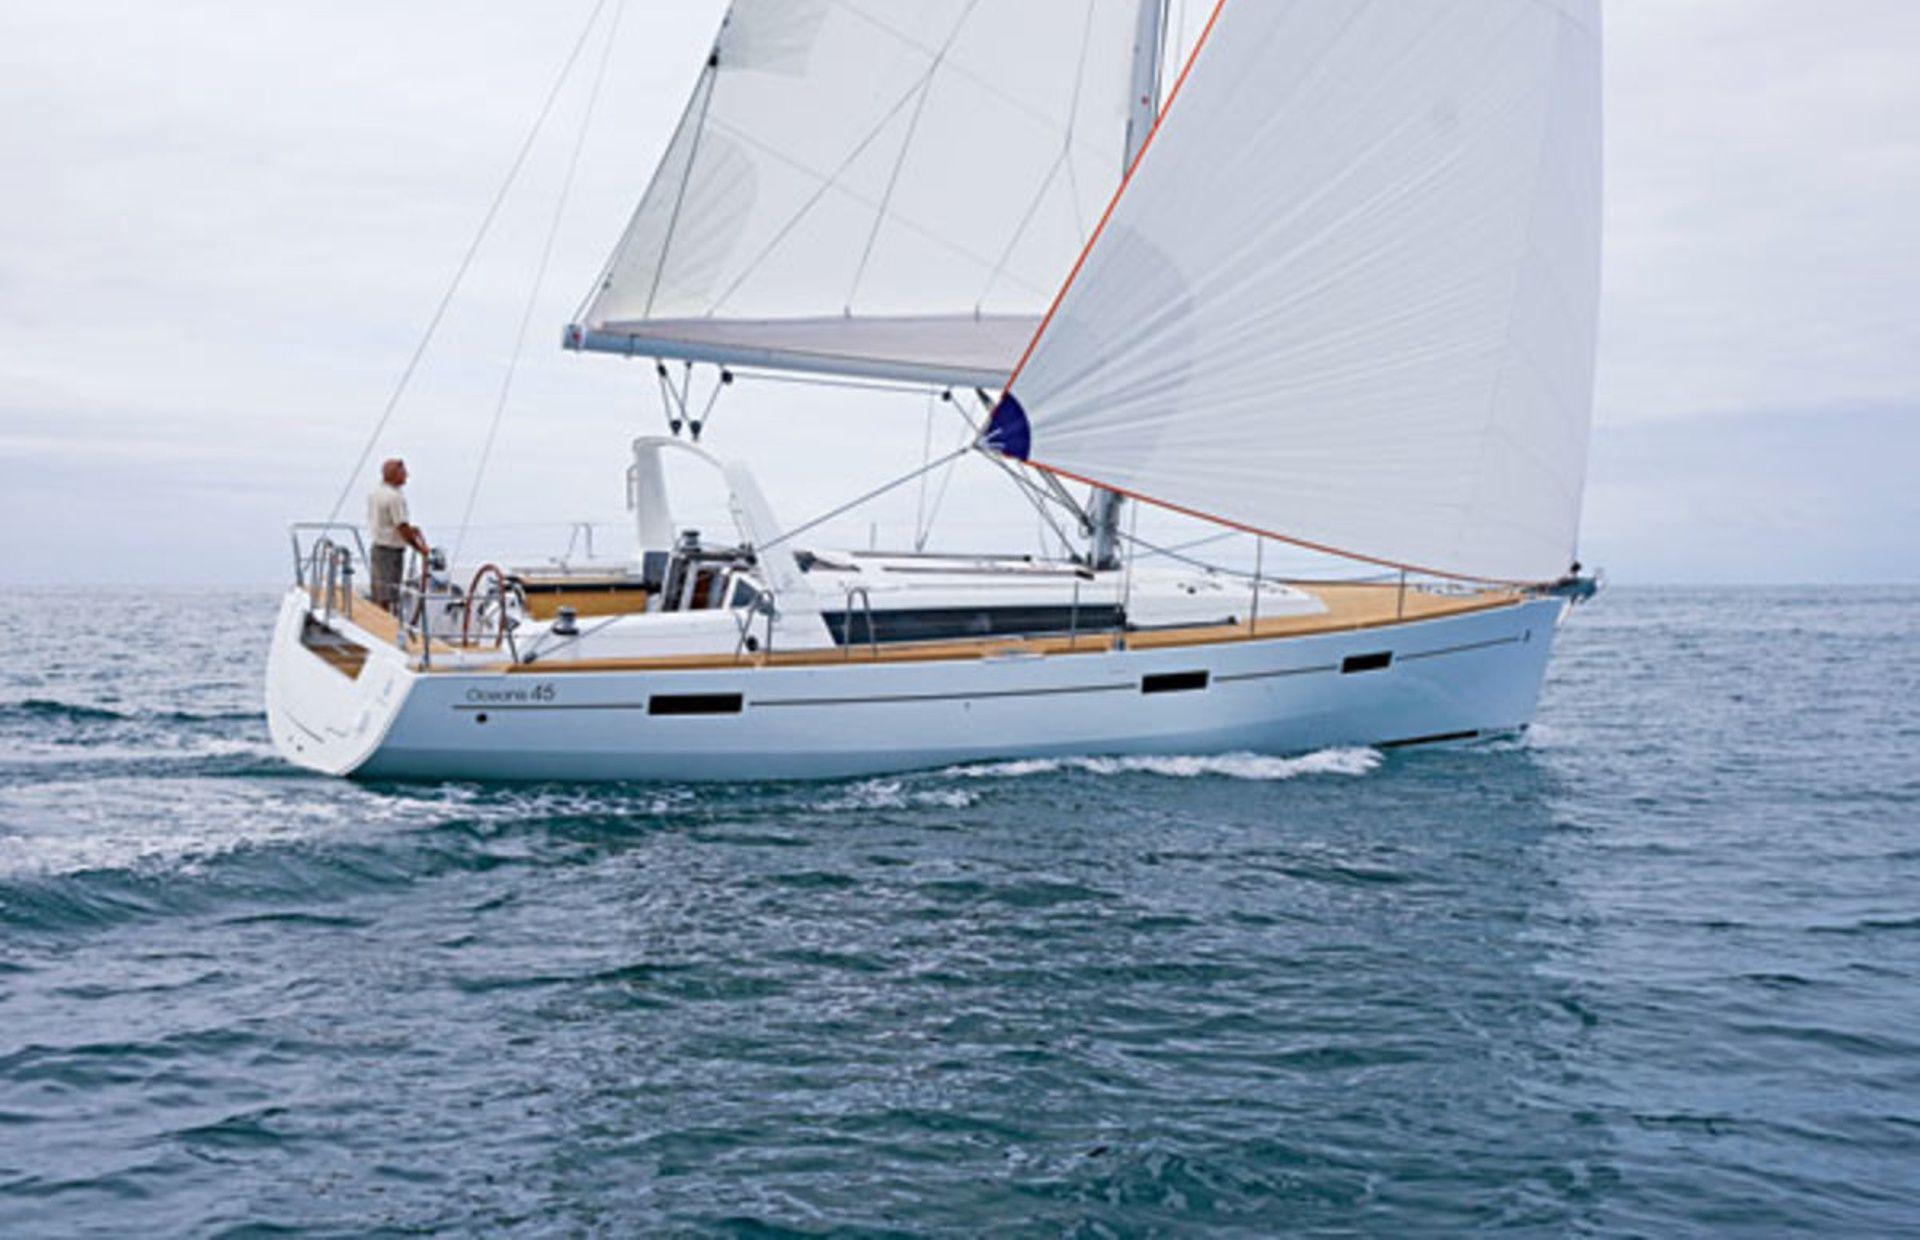 https://media.insailing.com/boat/oceanis-45/image_1596798028533.jpg